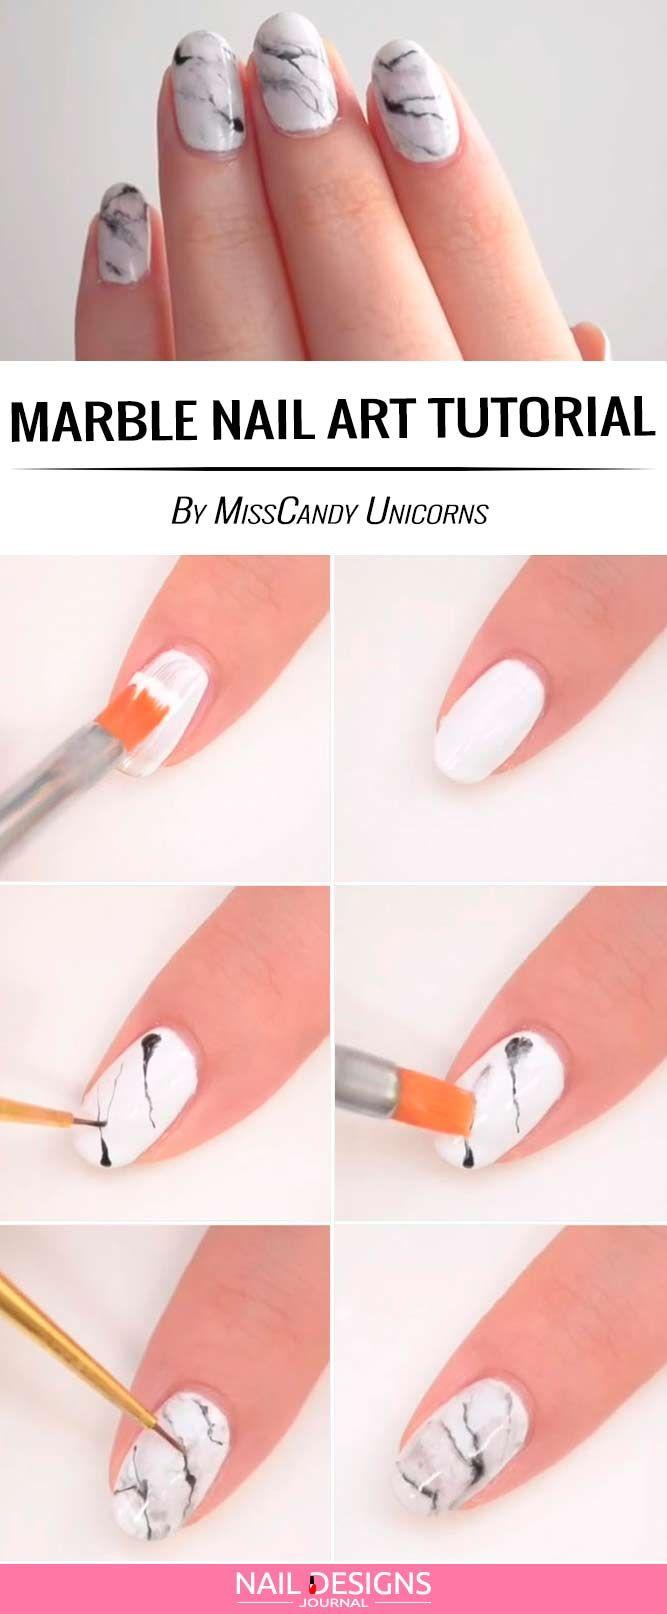 9 super easy nail design